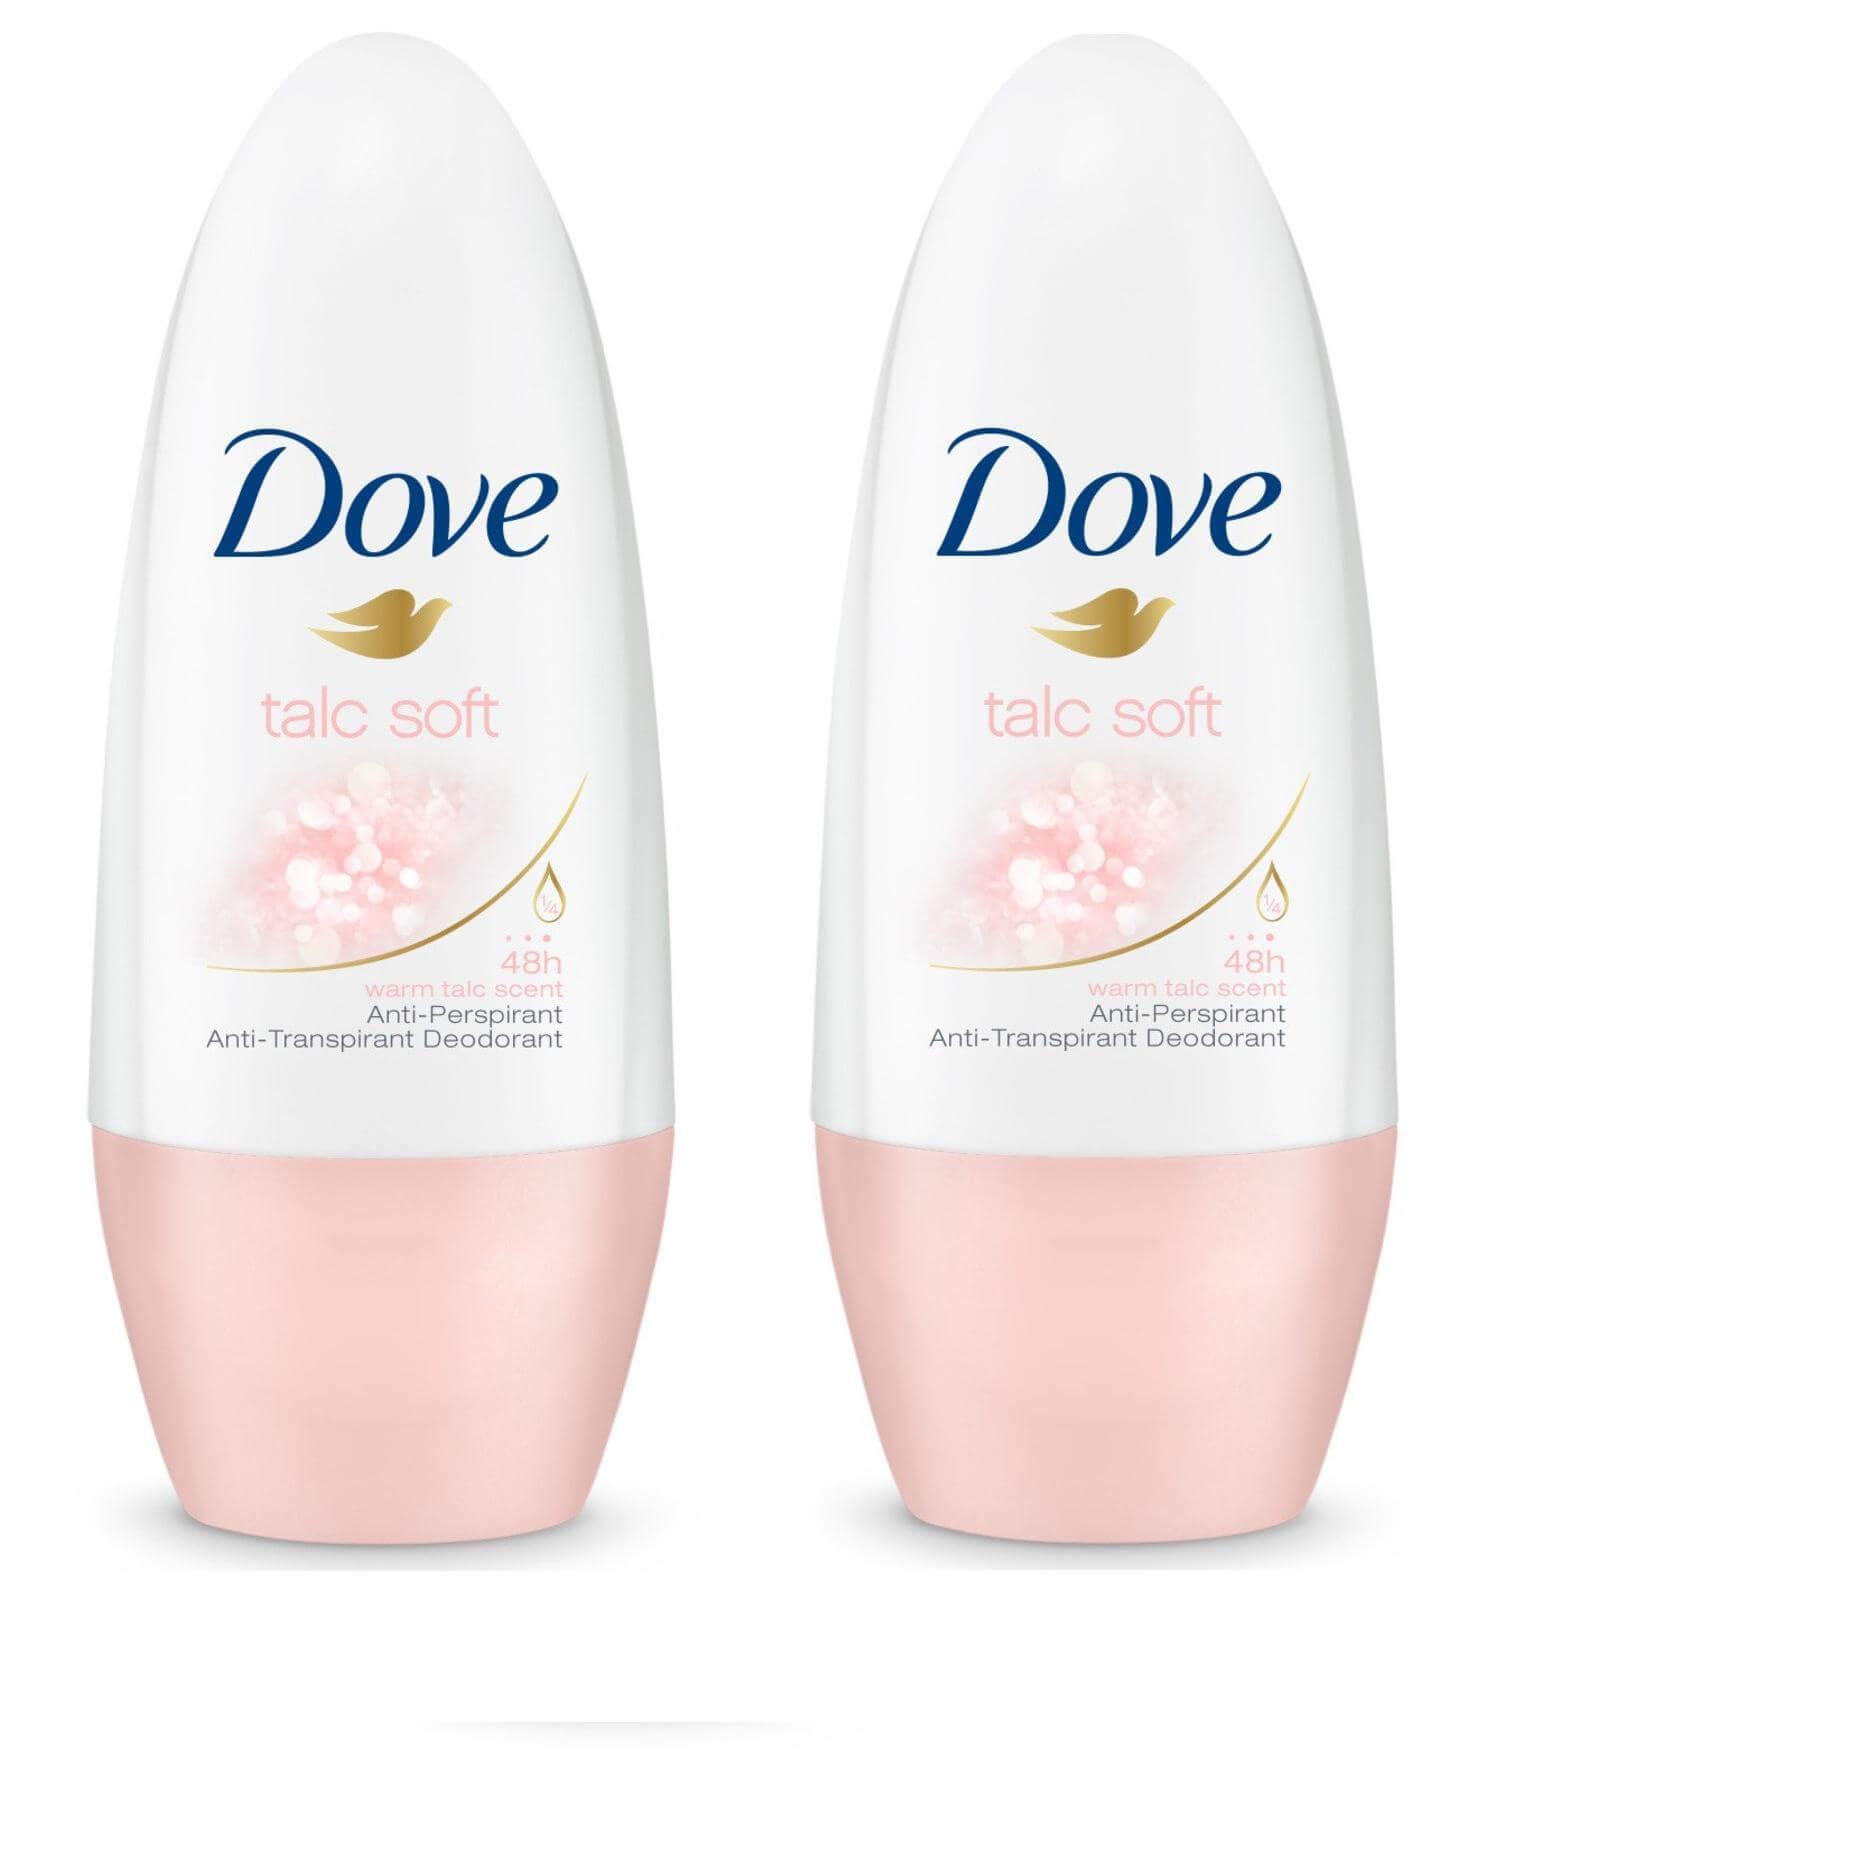 Dove Αποσμητικό Roll on Talc Soft 2 x 50ml Πακέτο 1+1